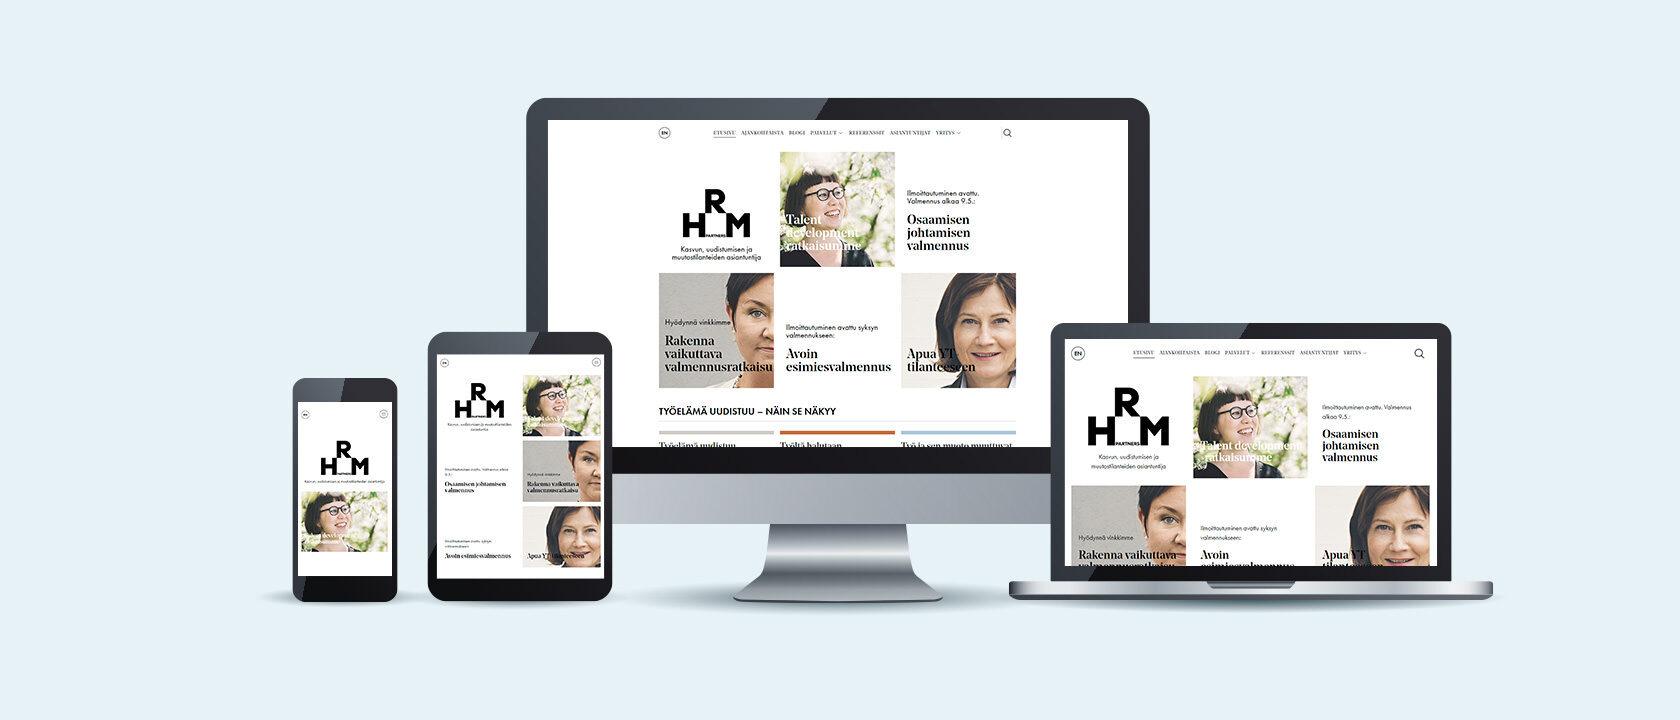 HRM Partners